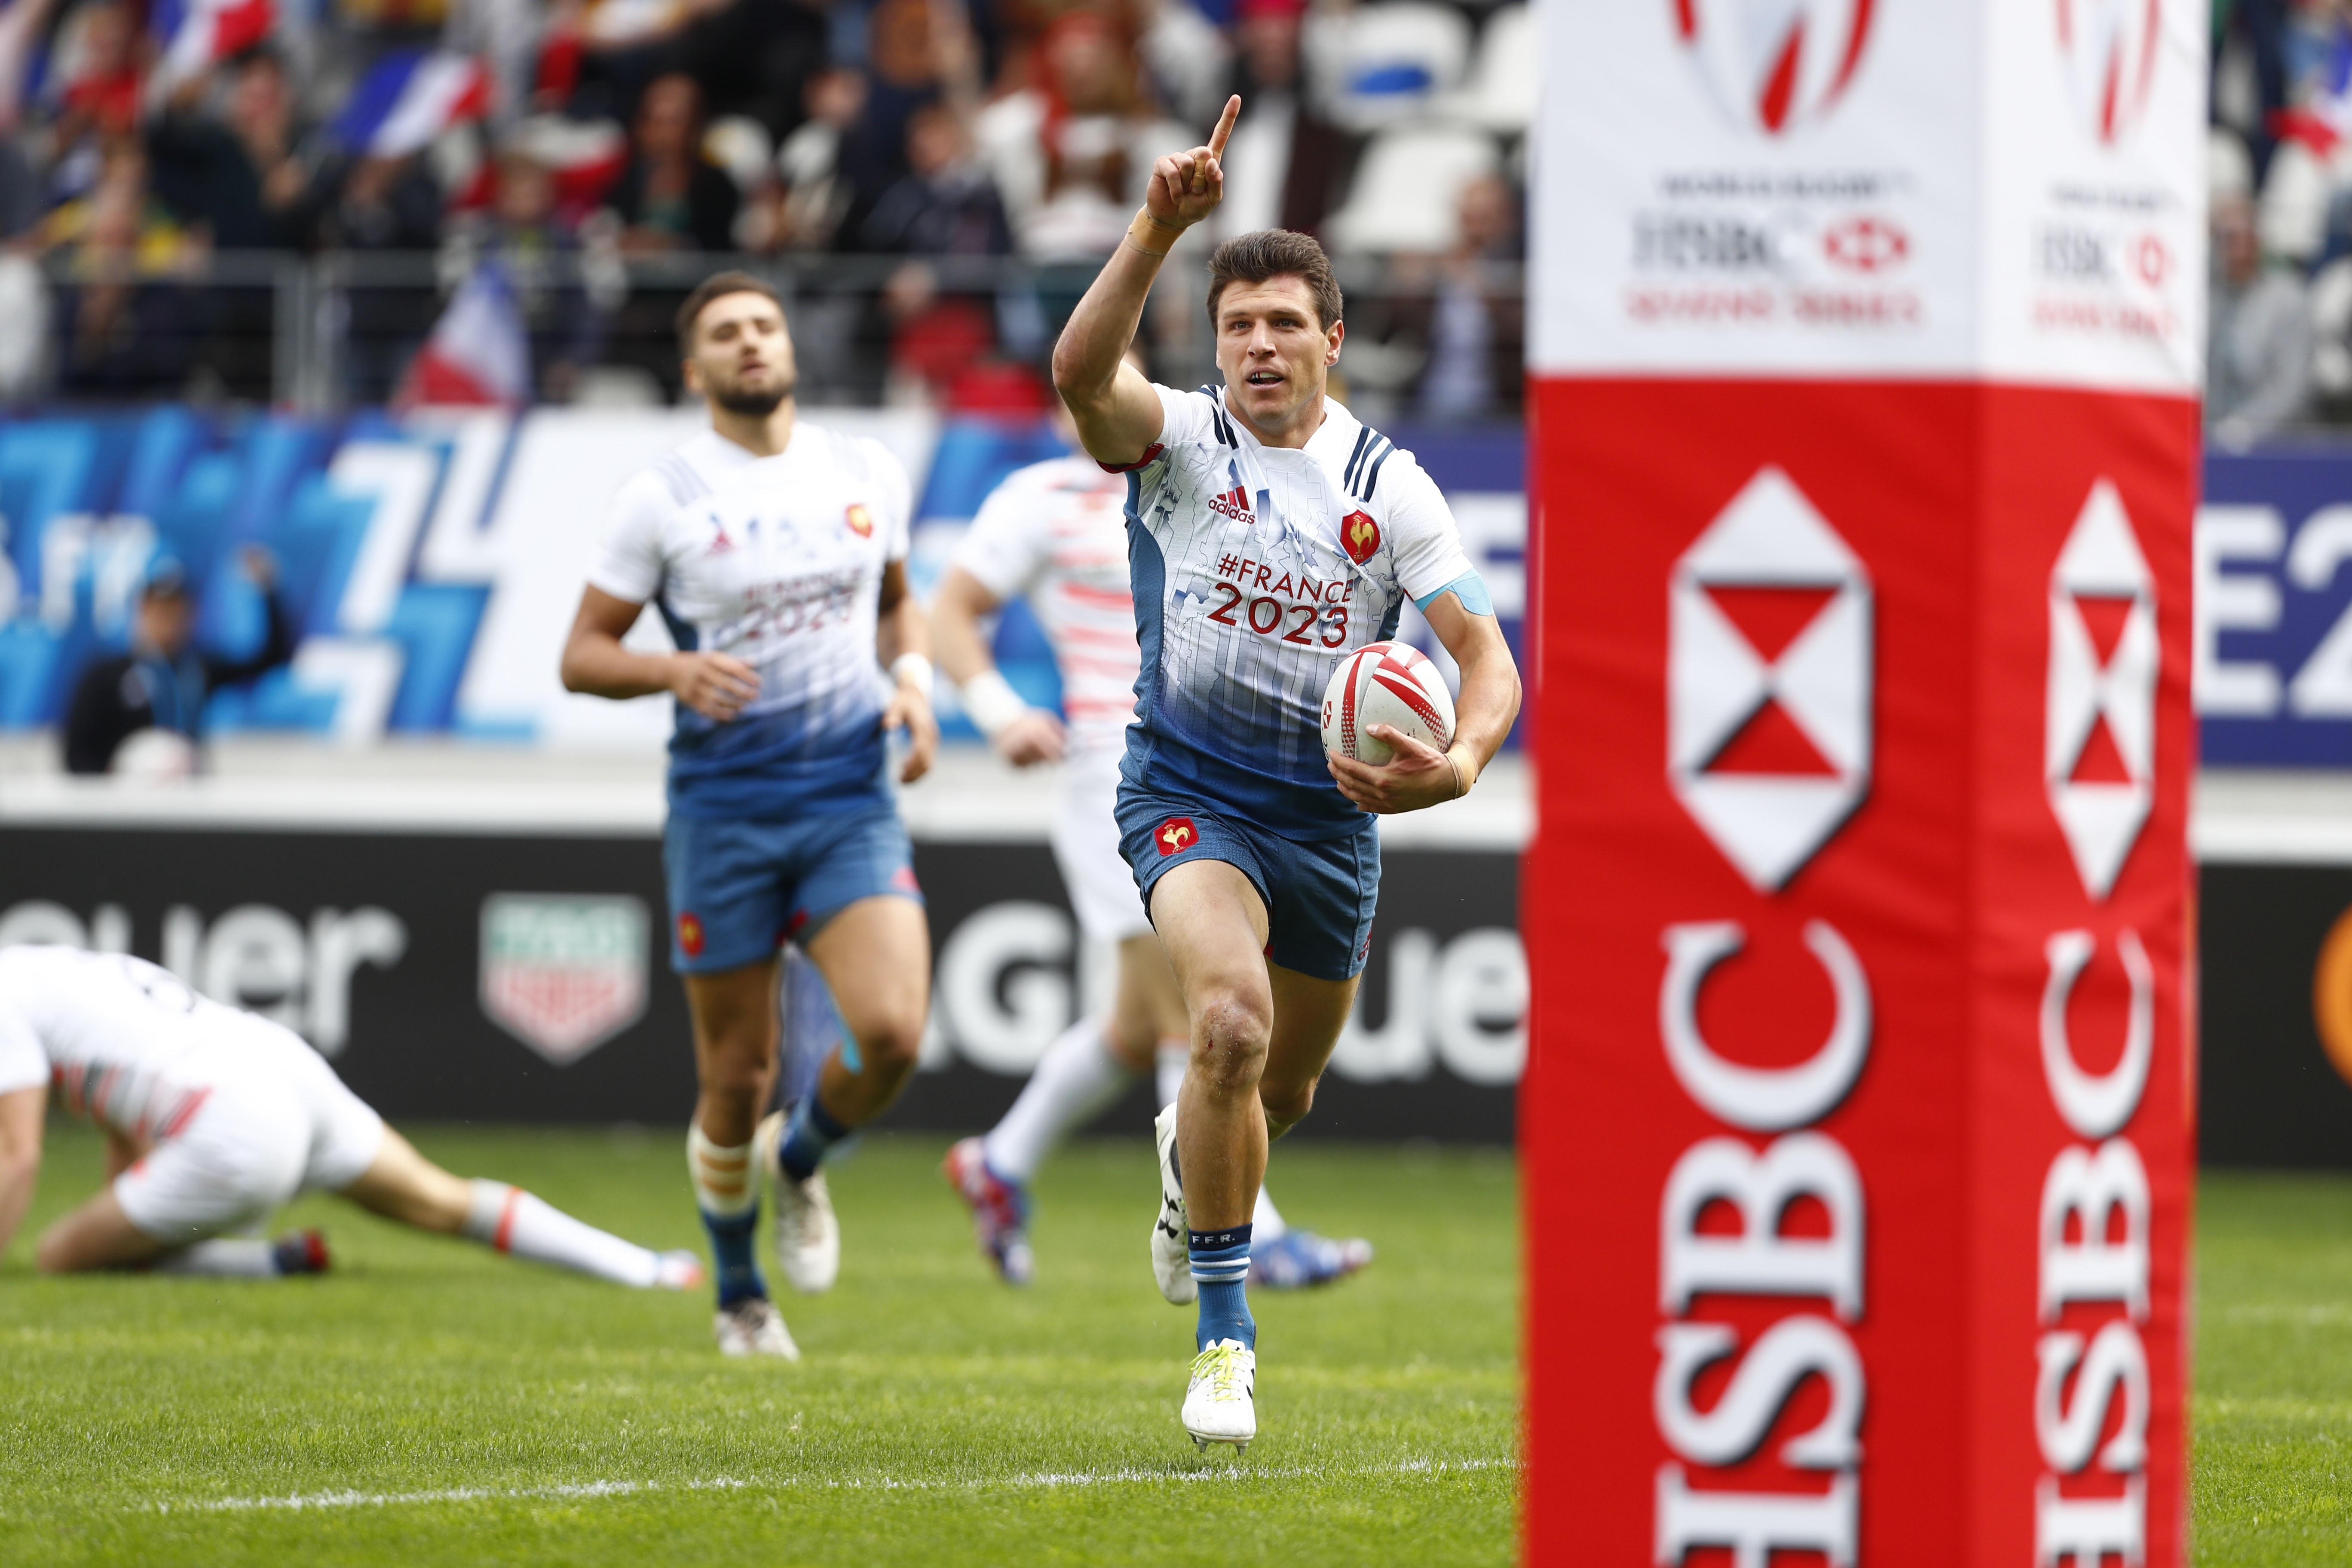 Rugby - XV de France - France 7 : Jérôme Daret entraîneur, Ben Ryan consultant ?